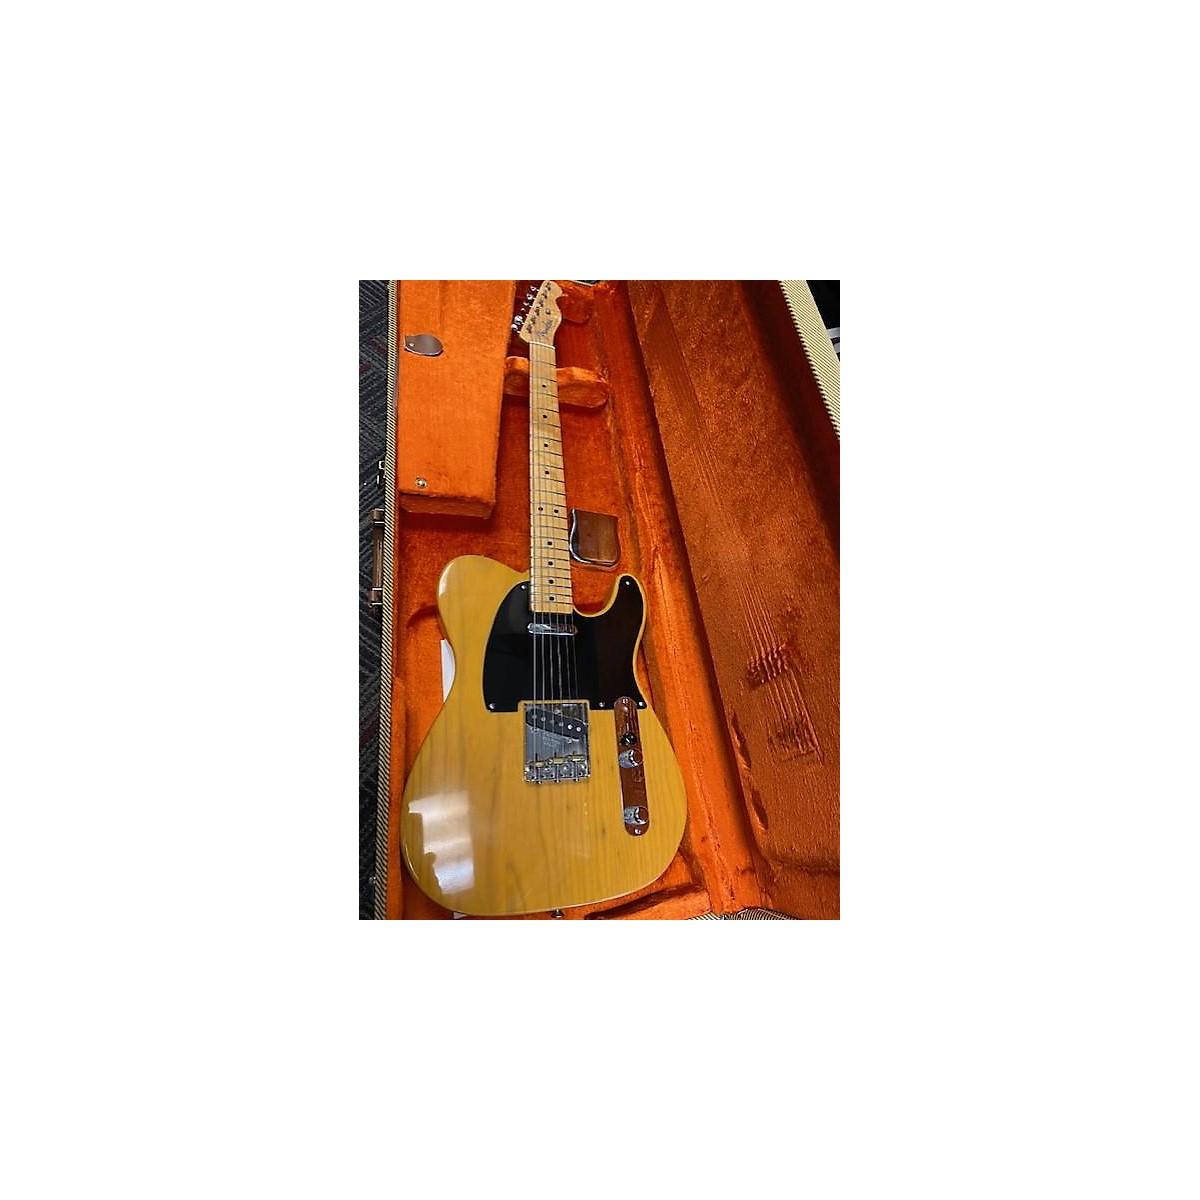 Fender 2003 American Vintage 1952 Telecaster Solid Body Electric Guitar